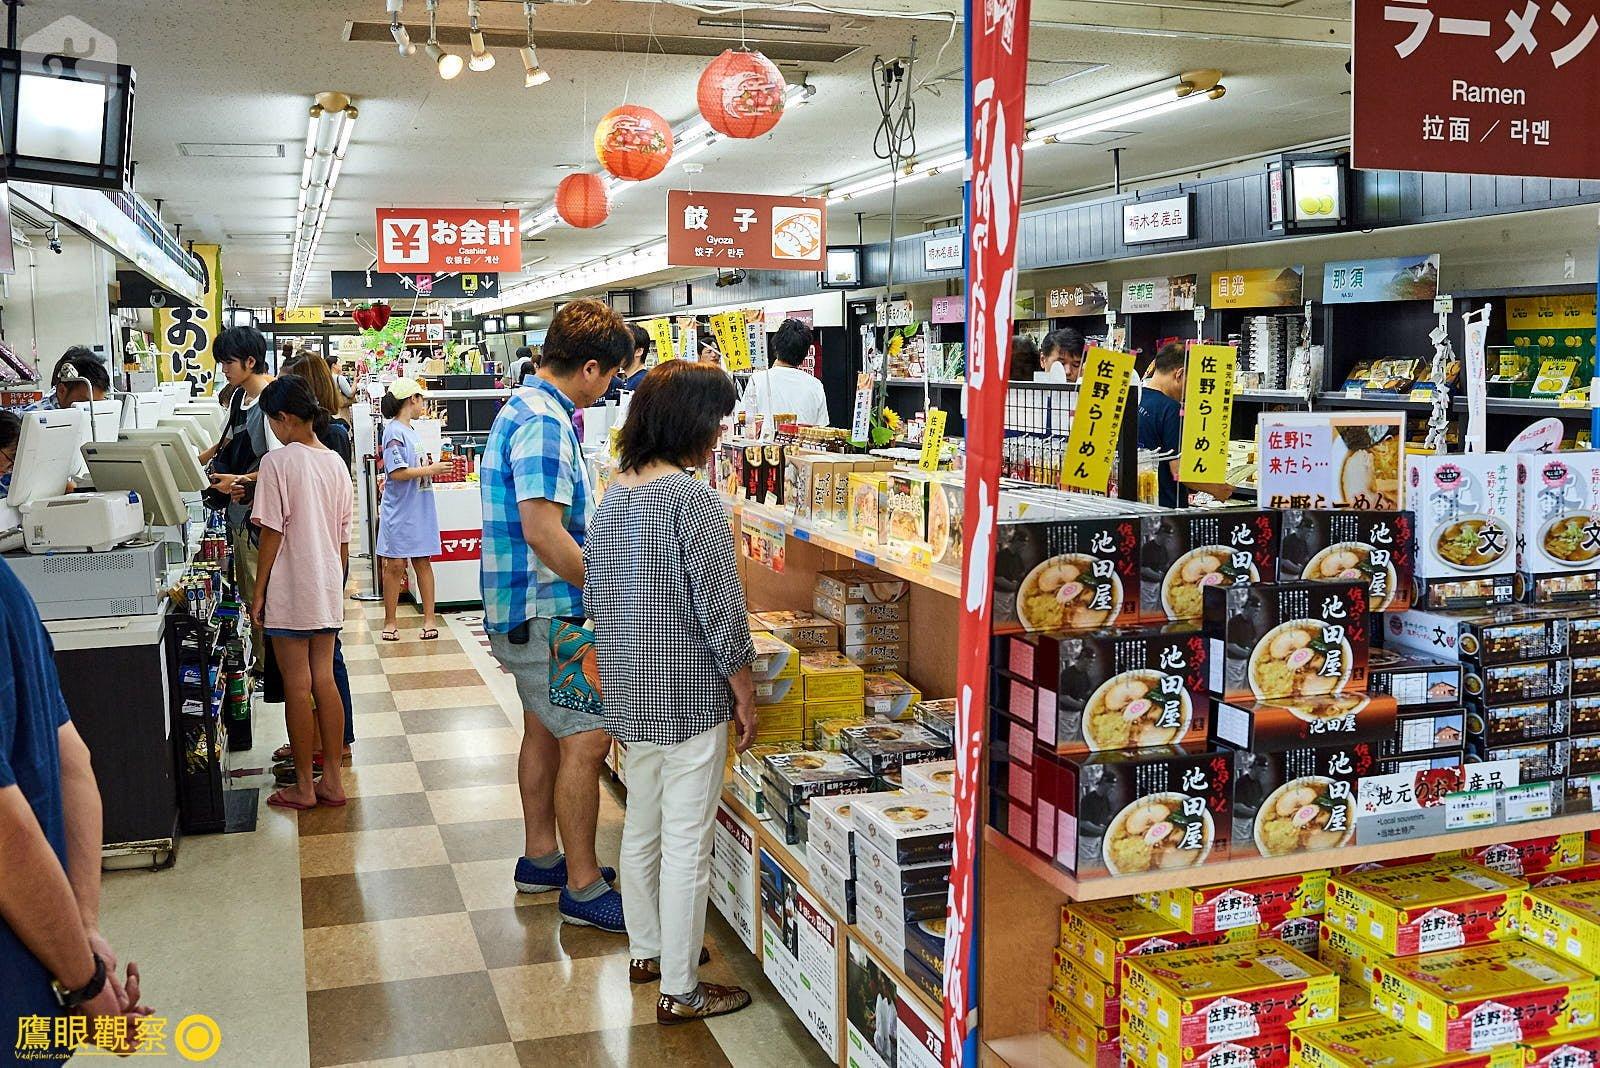 Japan Travel Highway rest stop 20190818110738 日本廢棄小學 🚗 RV 休旅車露營、森林探險之旅(櫪木縣鹿沼市立久我小學)🇯🇵⛺️